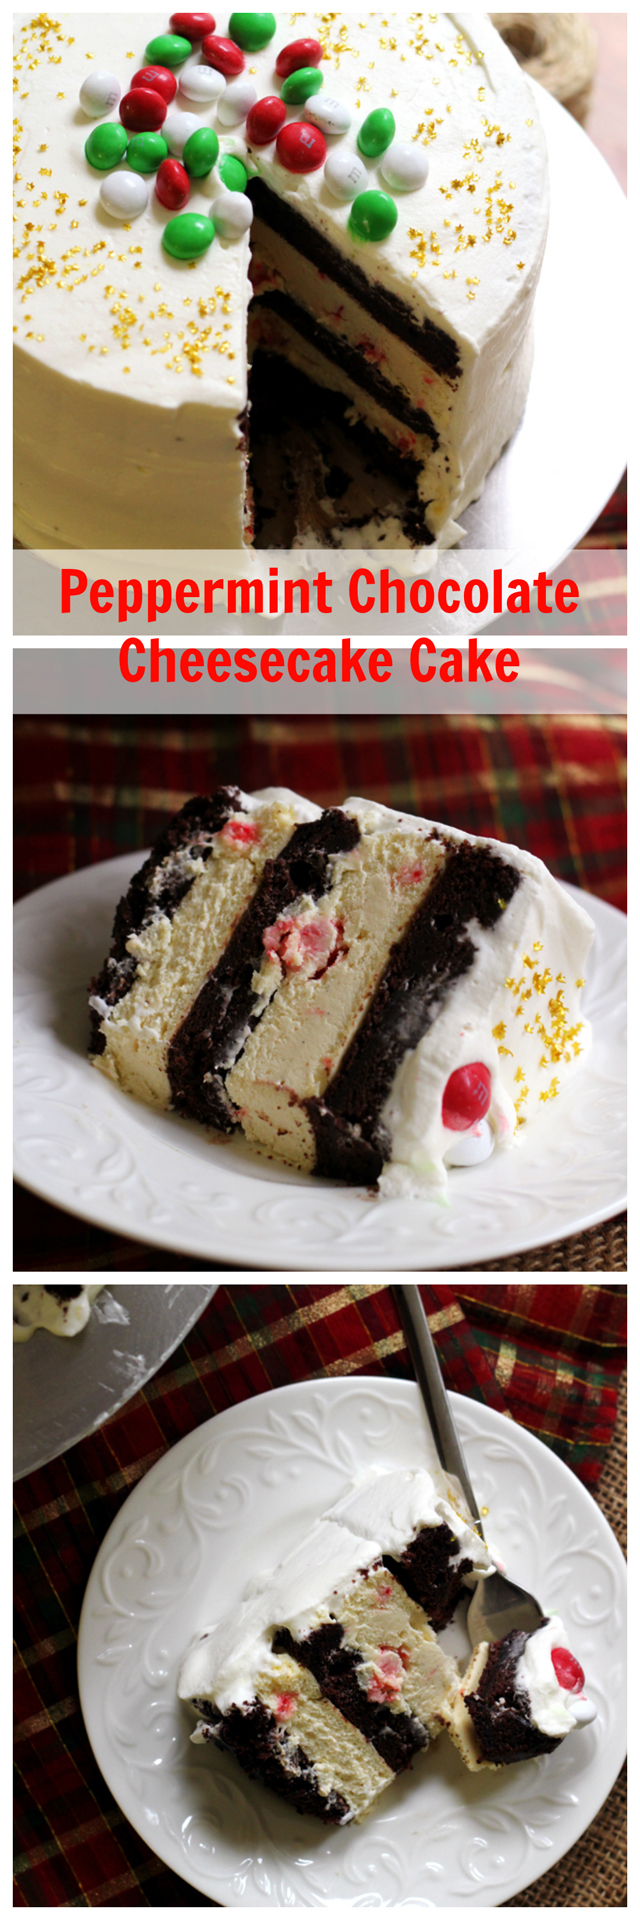 peppermint chocolate cheesecake cake